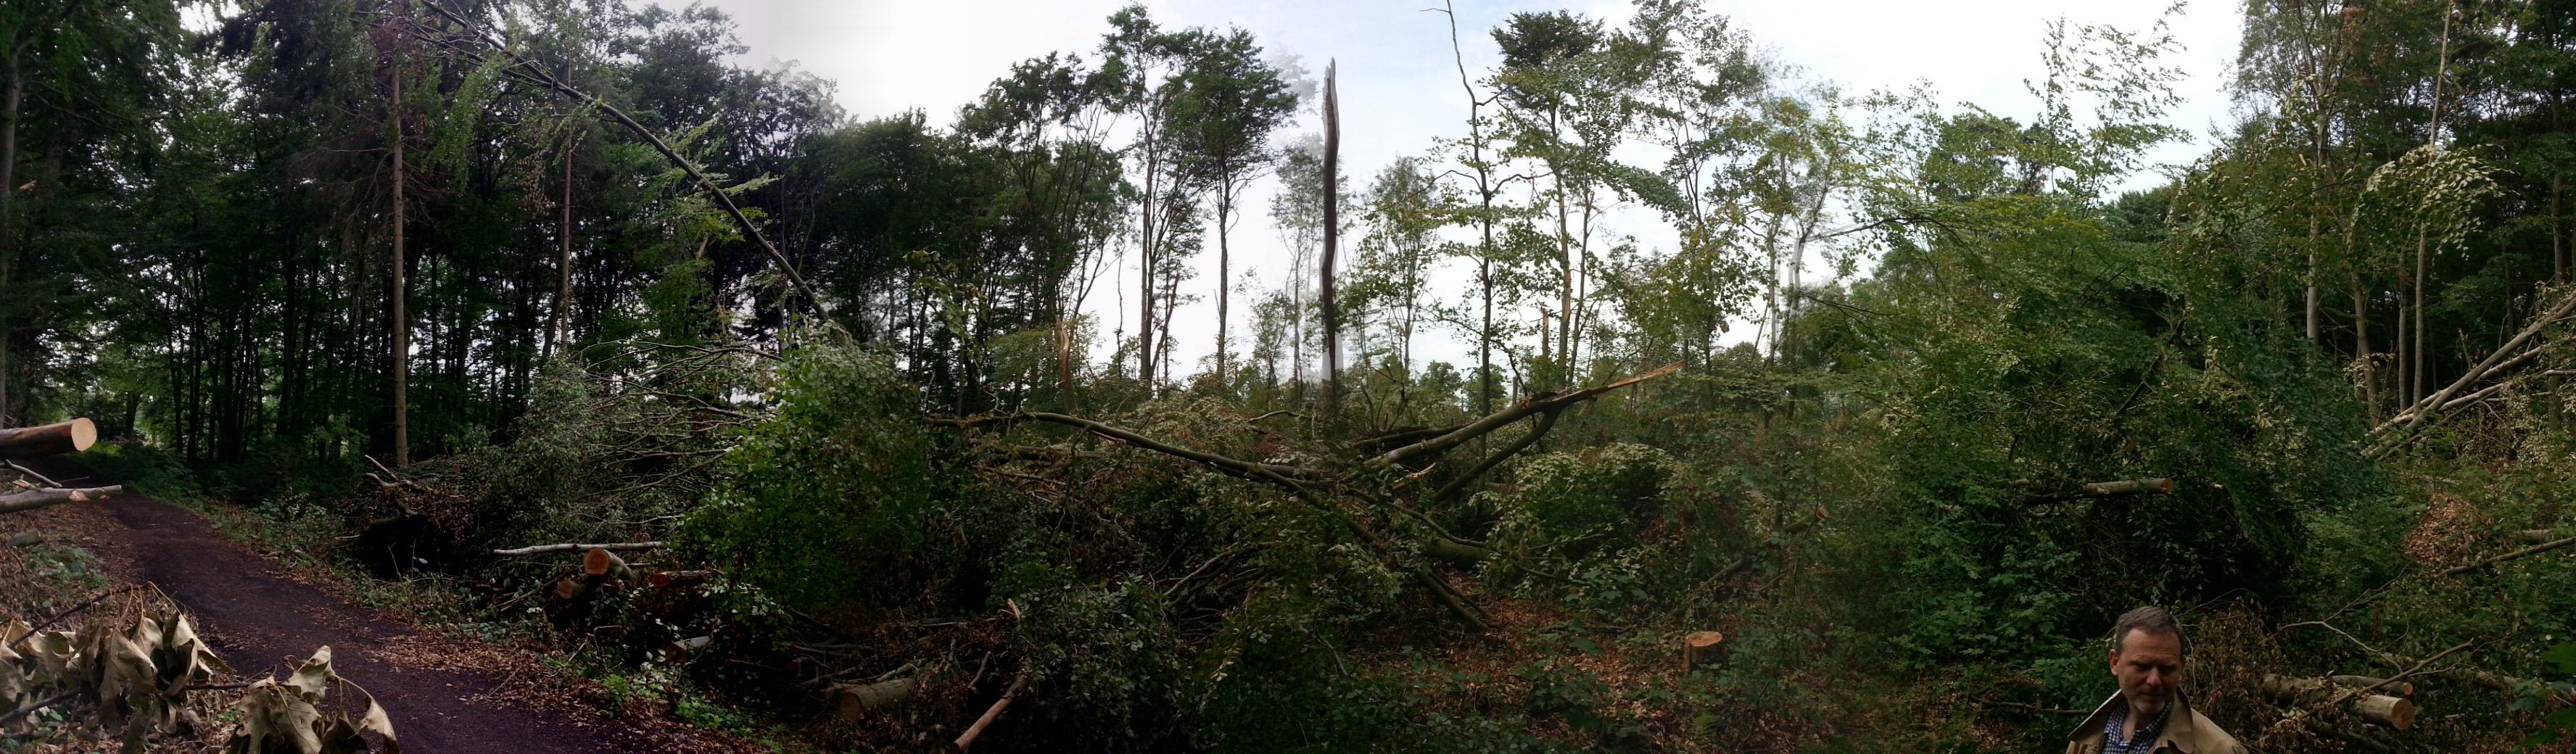 Sturmschäden im Wald bei Lüdinghausen